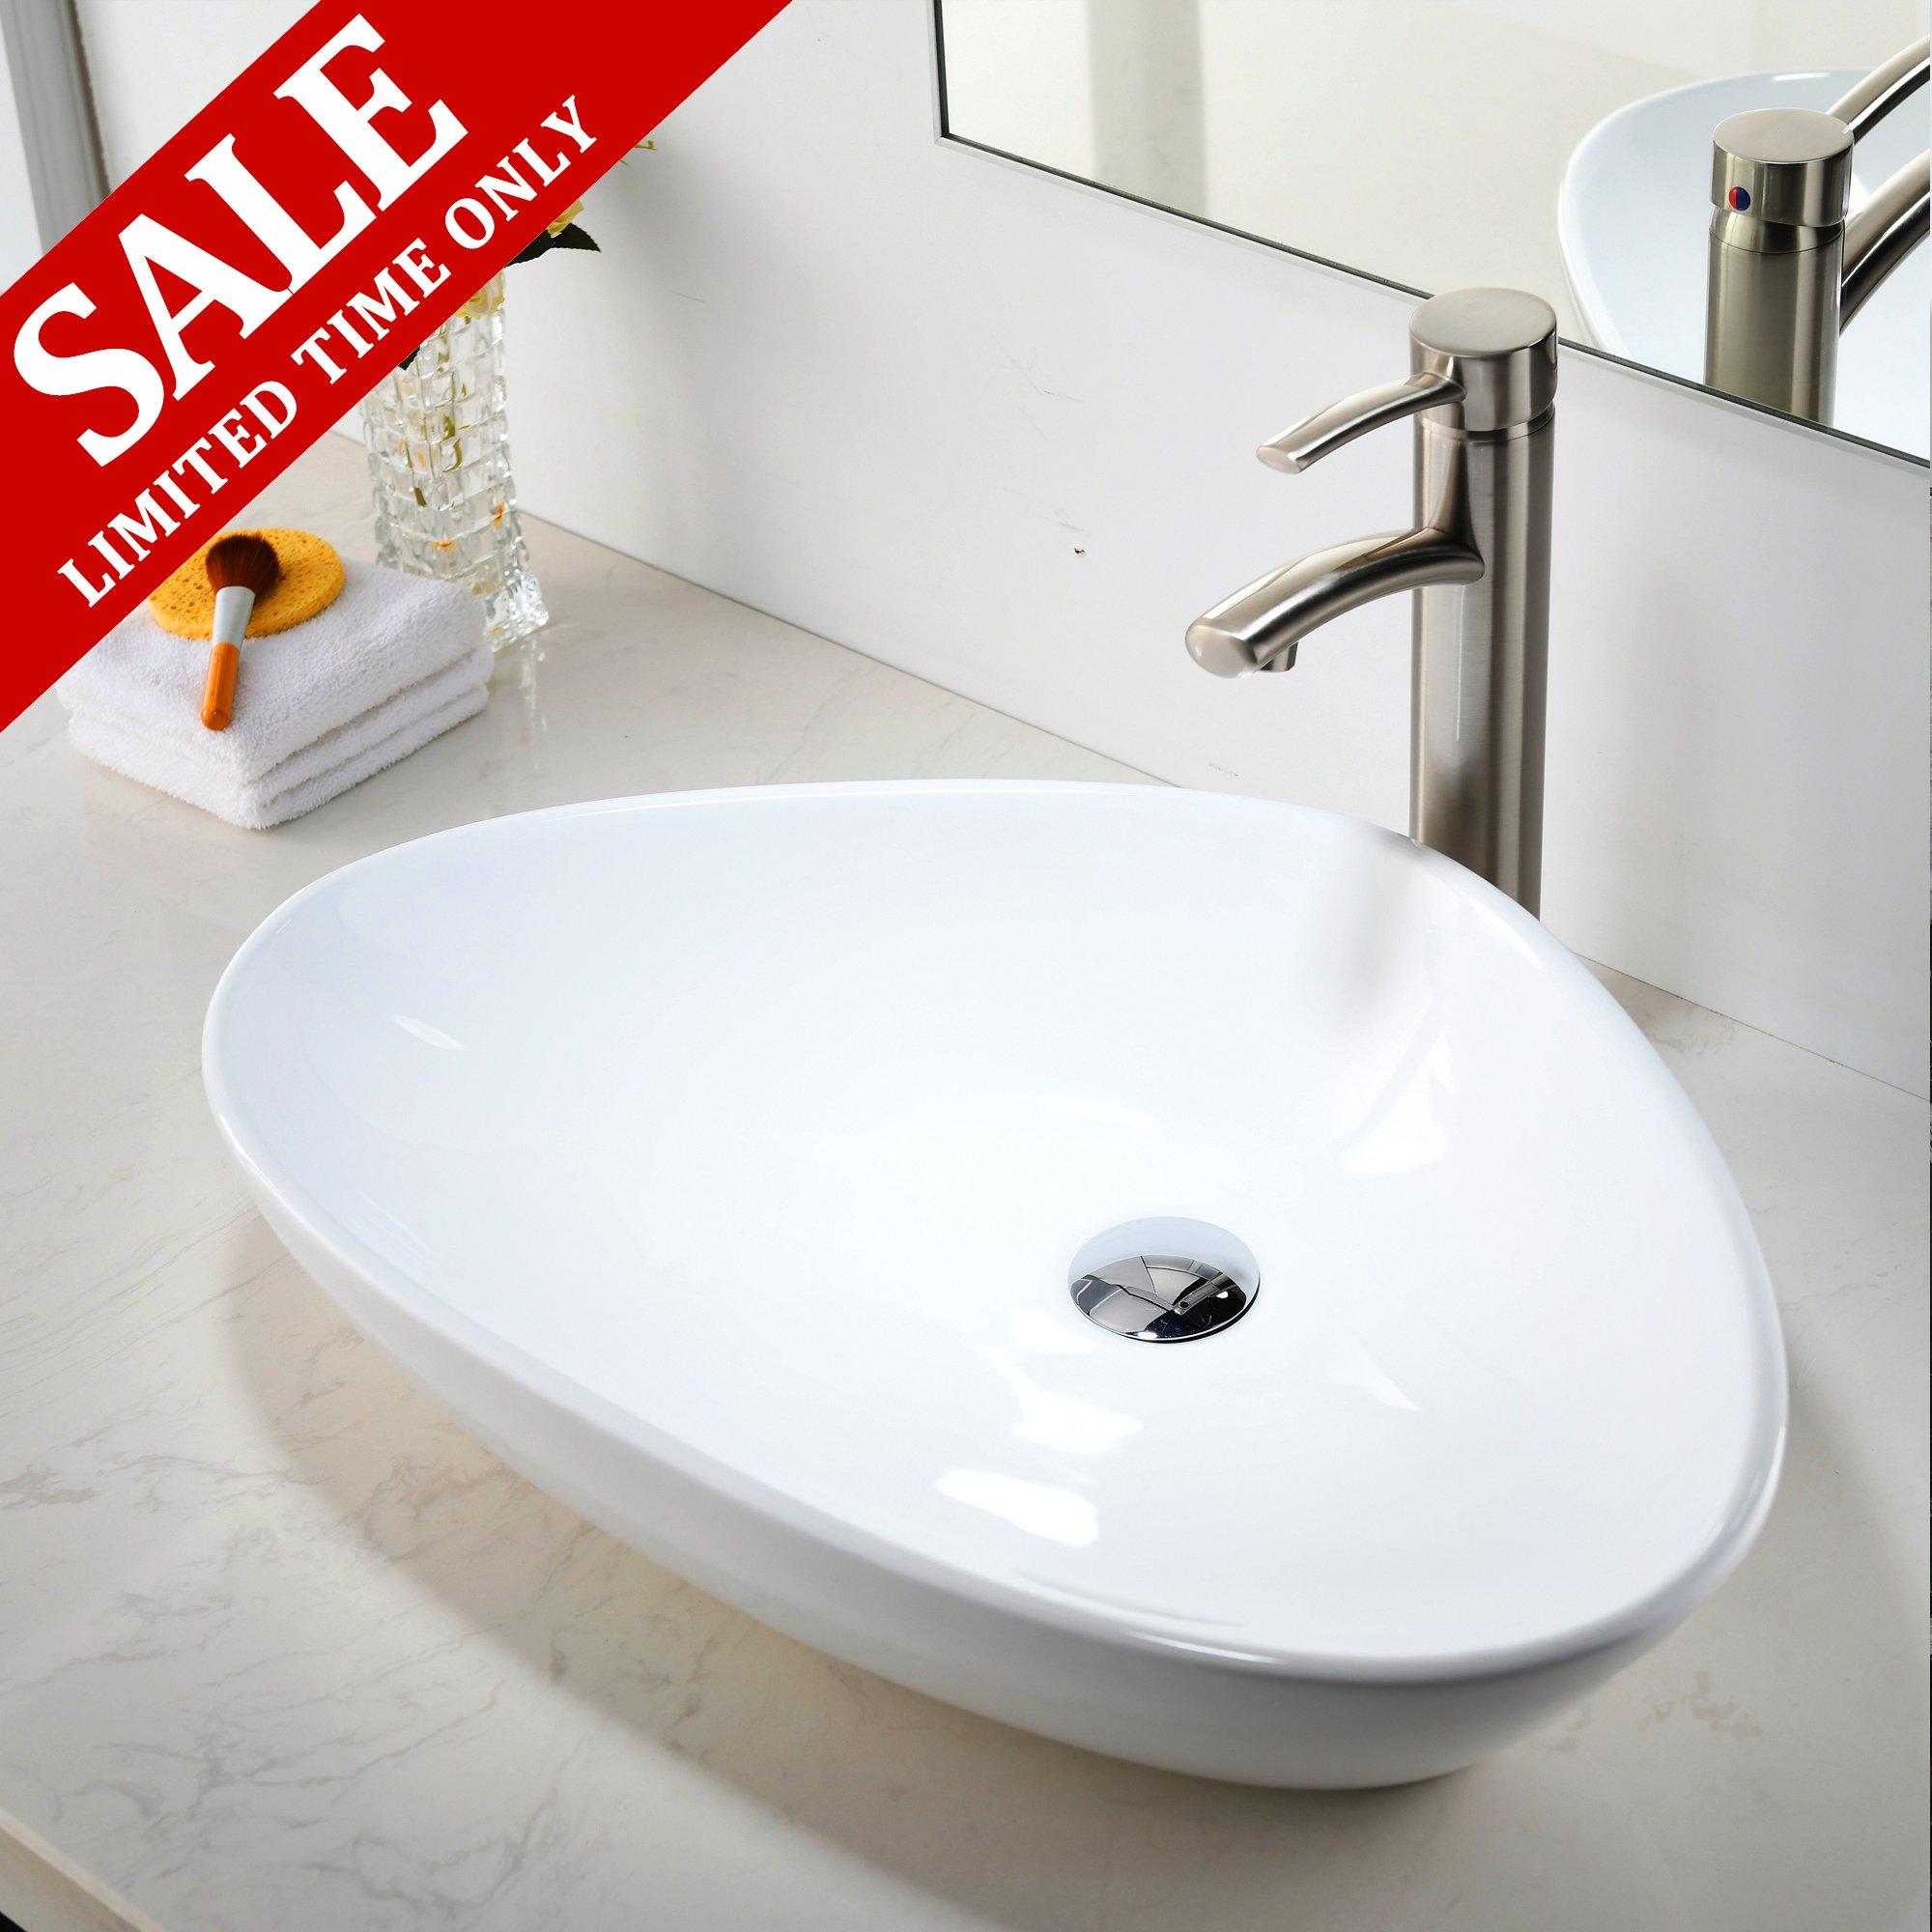 Comllen Contemporary Ceramic Bathroom Vessel Sink, Art Basin 23.2'' x 15.7'' Porcelain Bathroon SInk